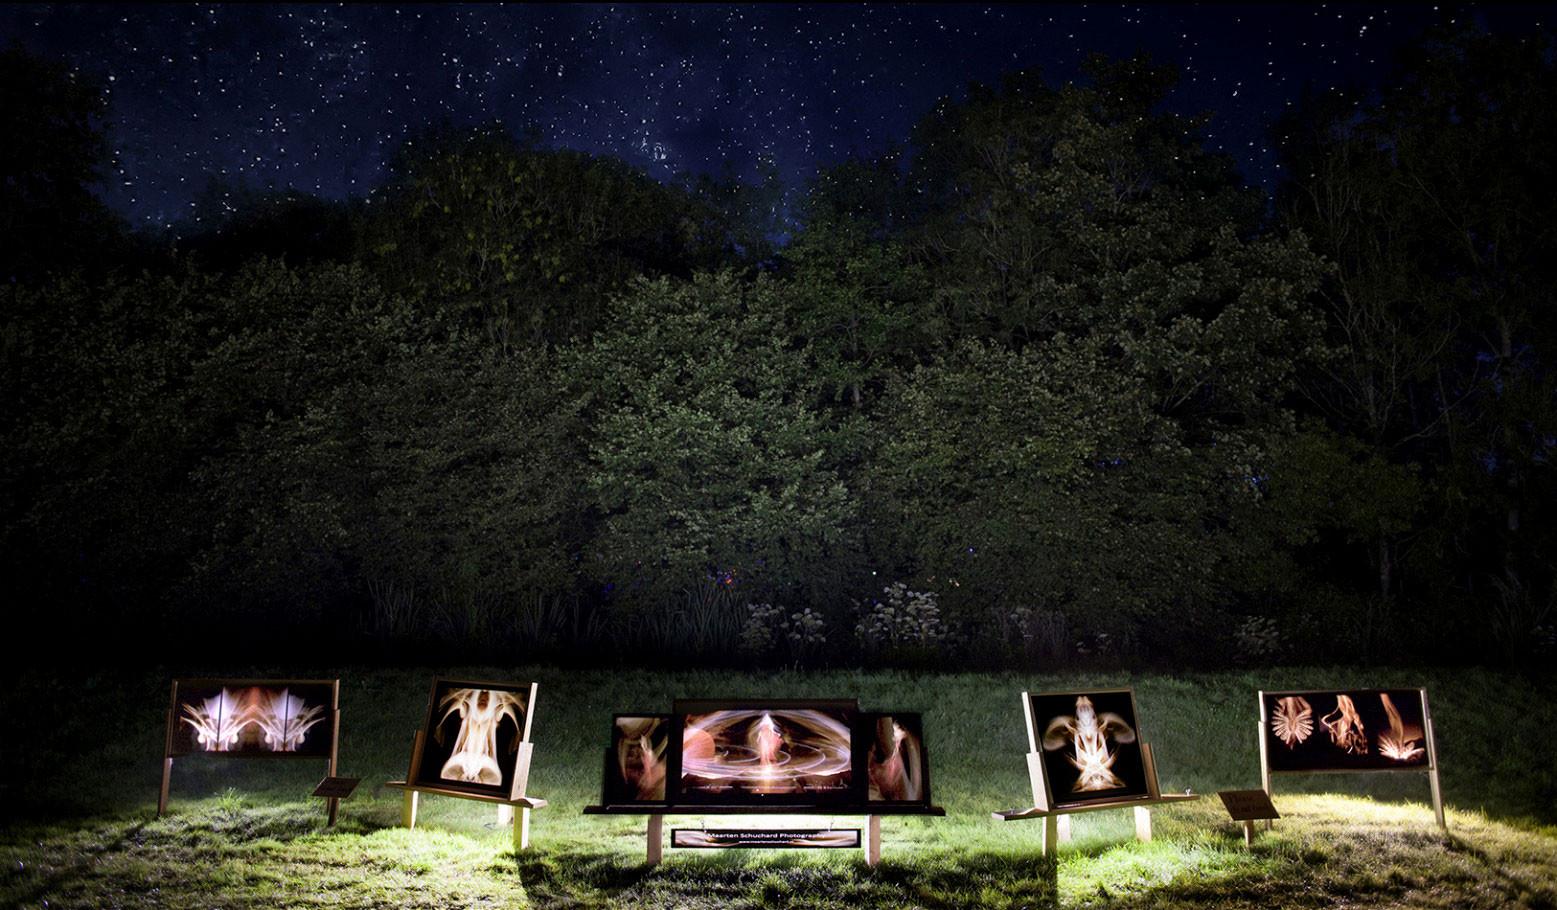 Psy-Fi festival 2015 - Art installation - www.psy-fi.nl